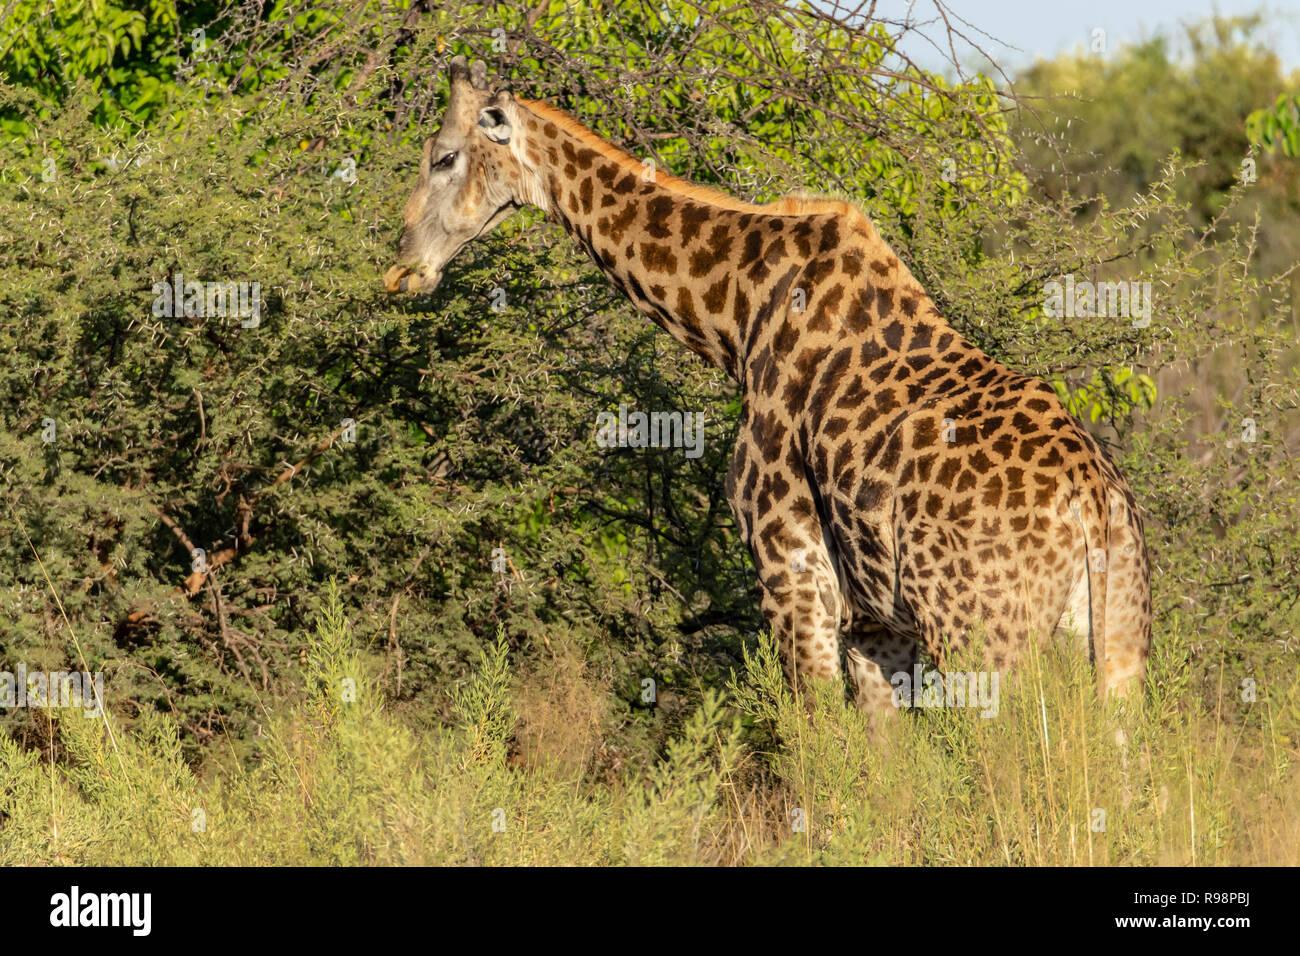 Namibian giraffe browsing acacia trees in Botswana, Africa - Stock Image